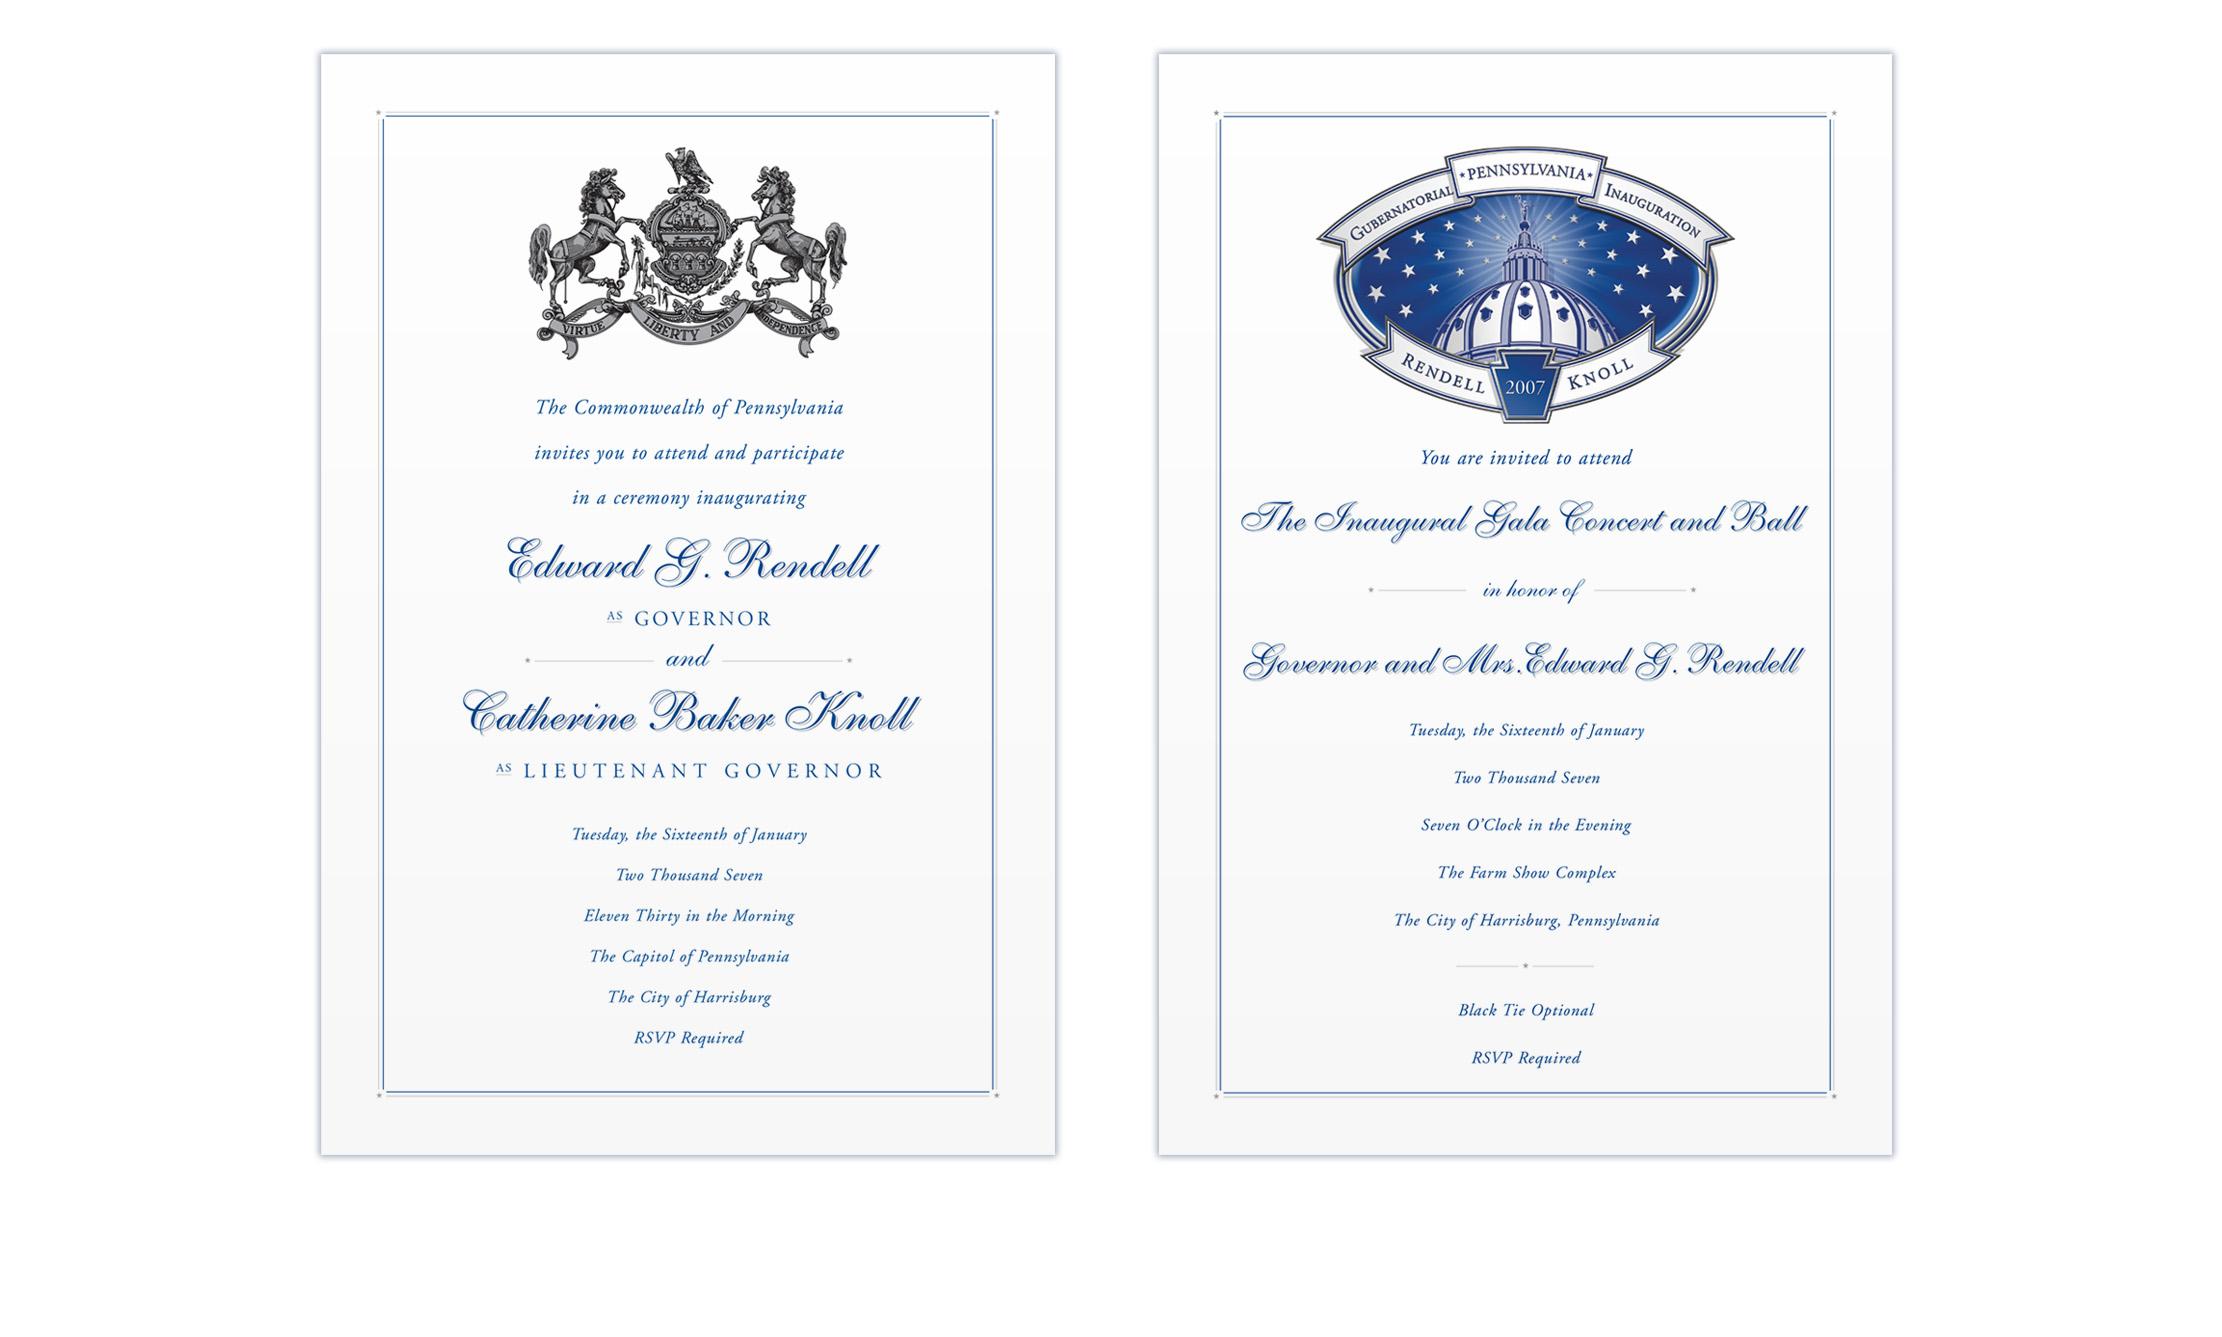 Rendell Knoll 2007 Inaugural Invitations